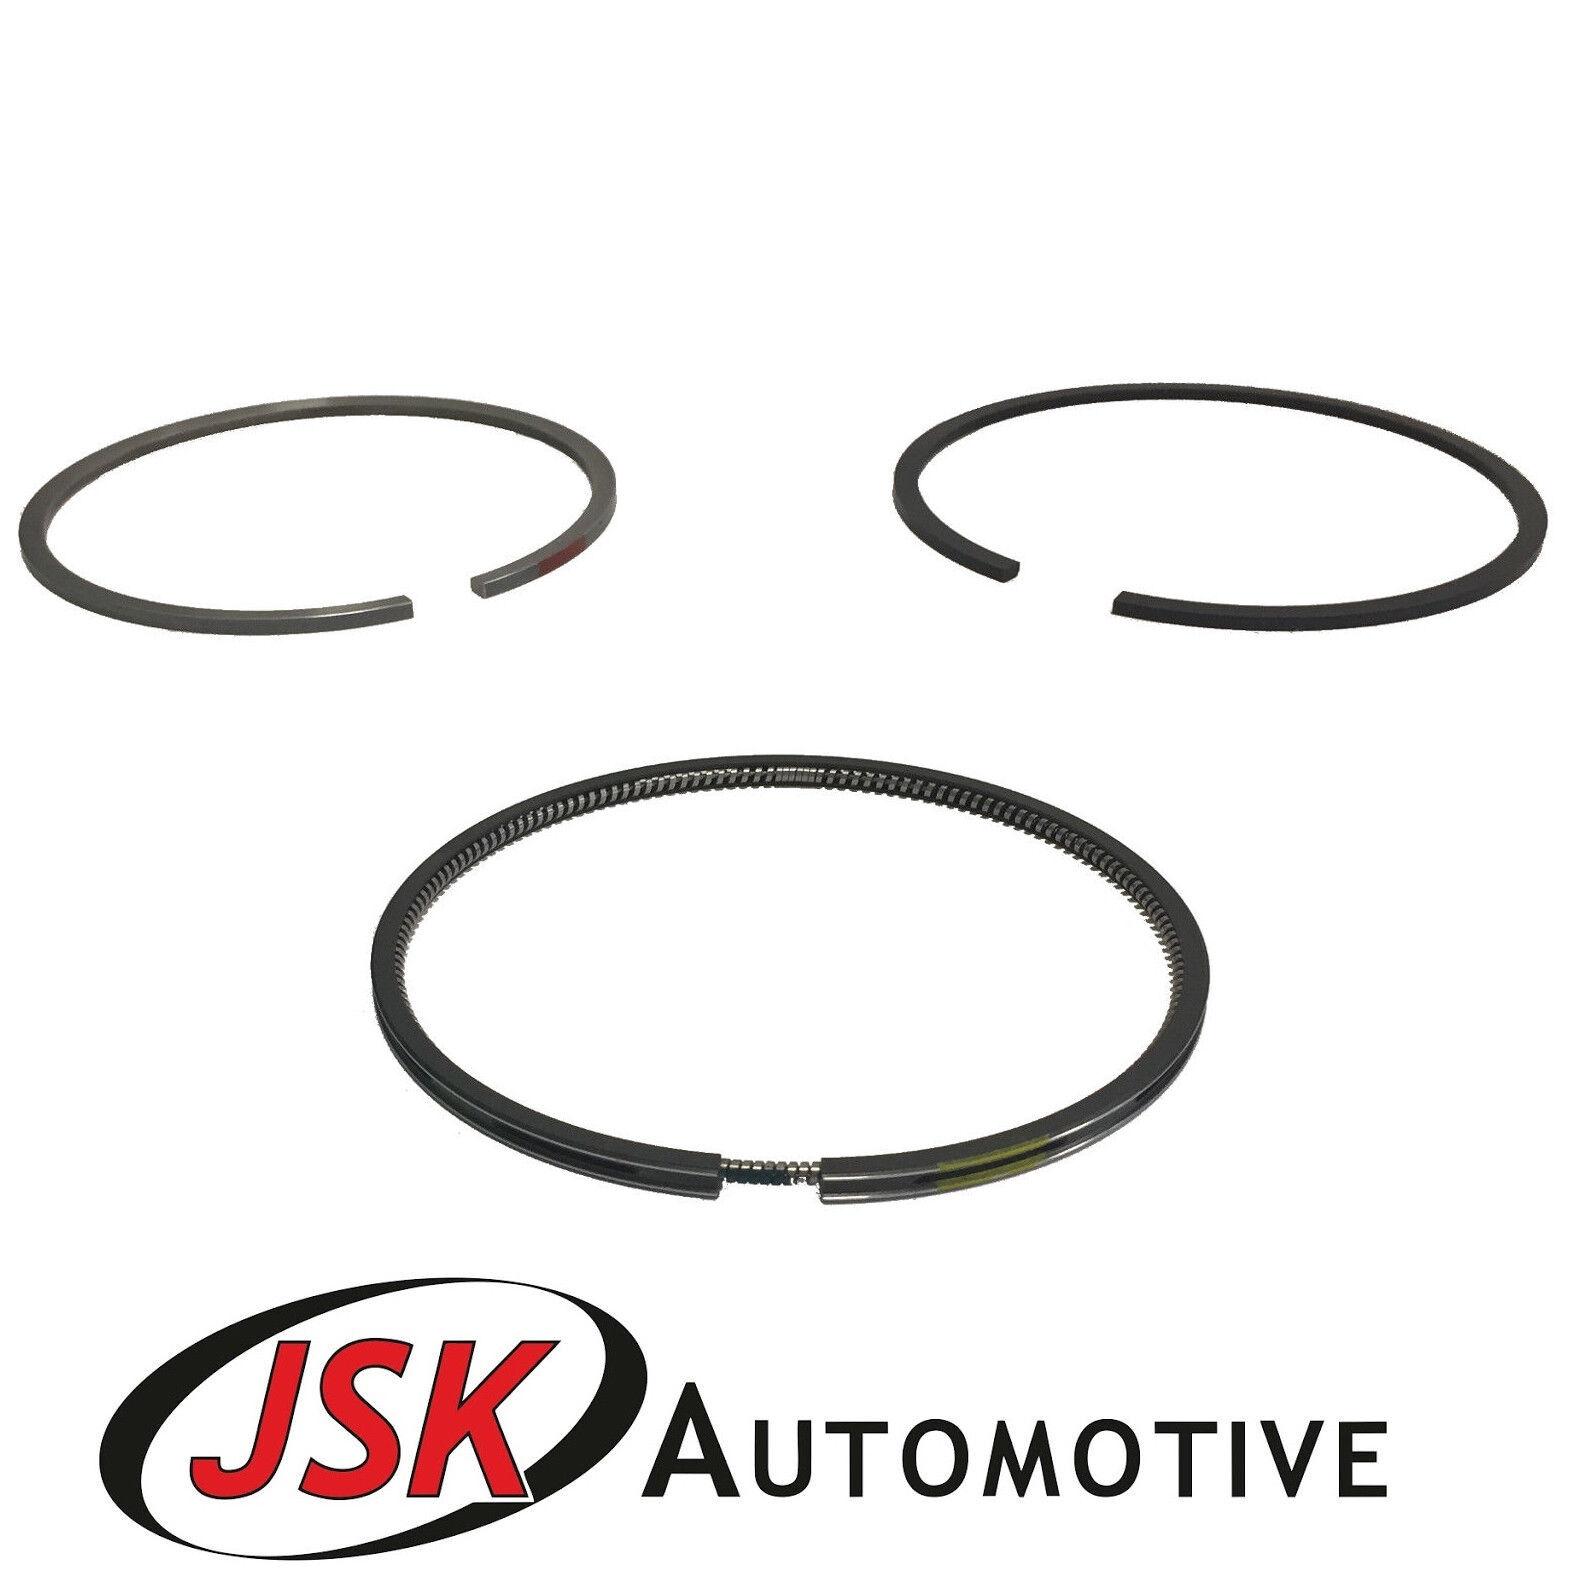 Piston Rings 100 mm JCB 2CX 3CX 3CN 4 C 4CN 4CX 411 412